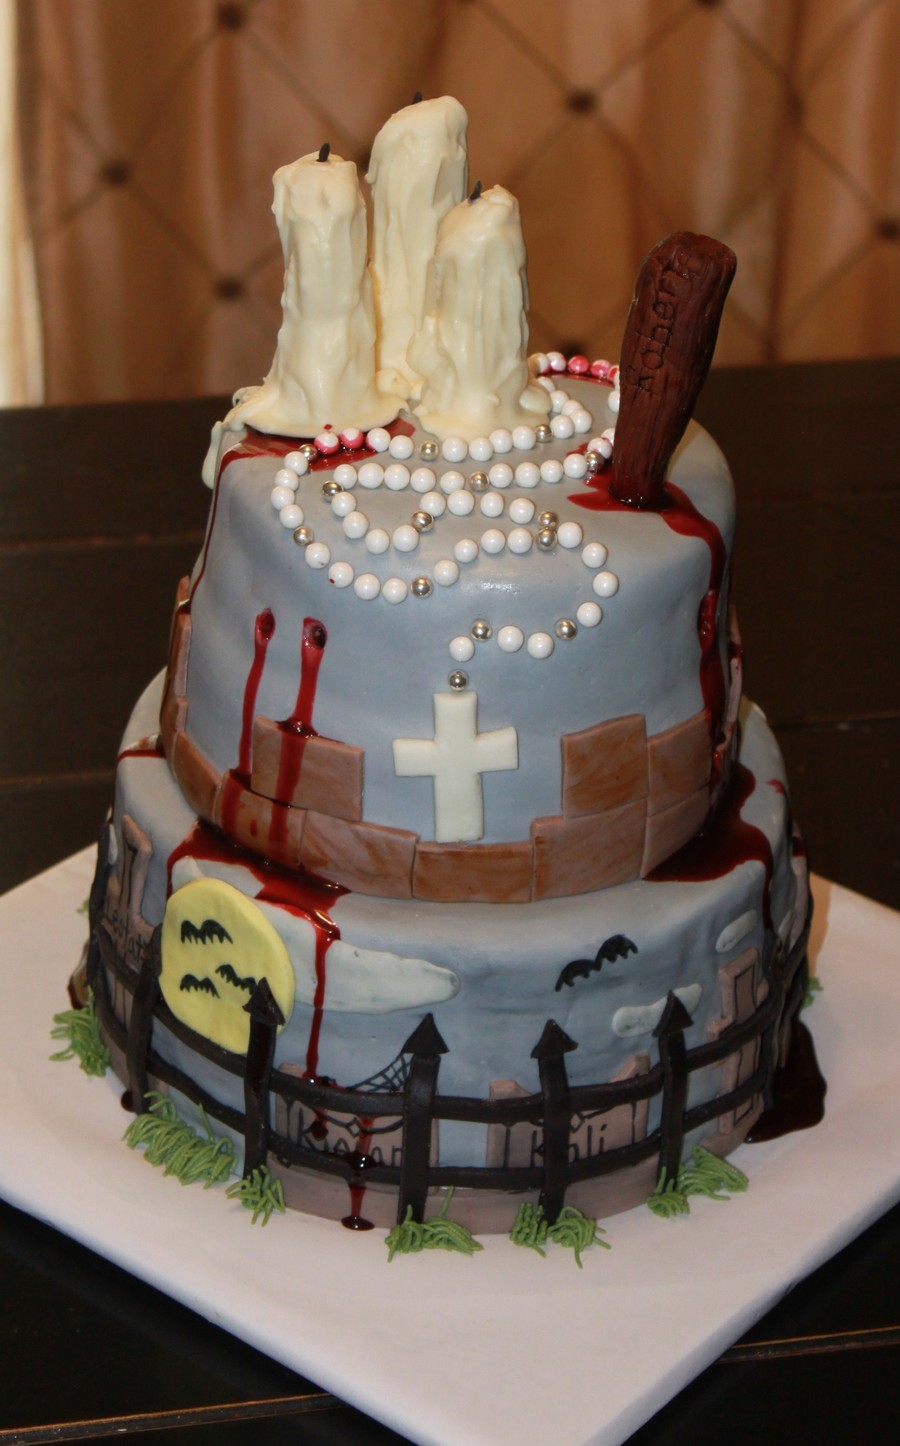 Phenomenal Vampire Birthday Cake Cakecentral Com Funny Birthday Cards Online Overcheapnameinfo